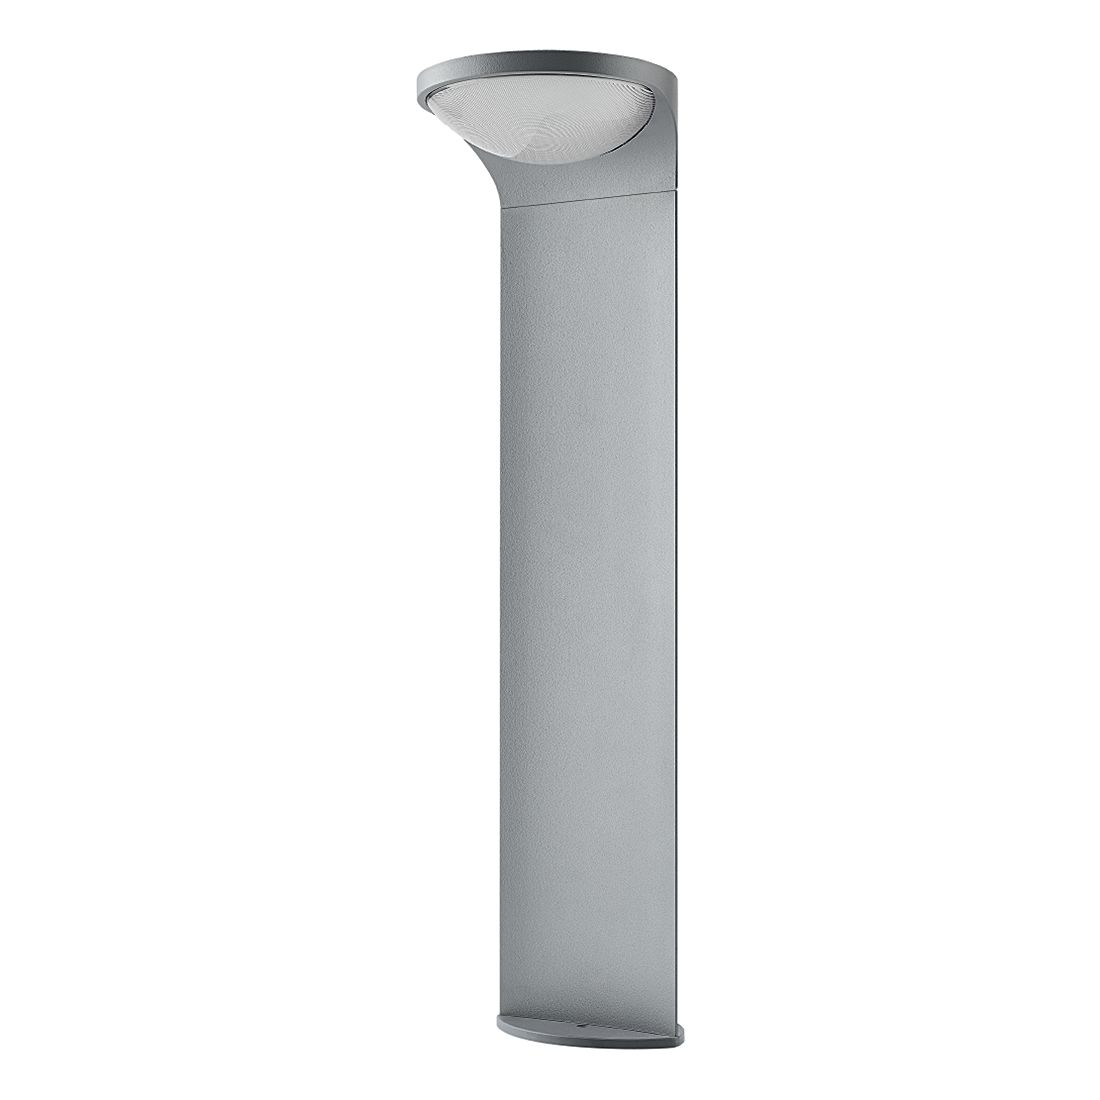 energie  A+, Buitenlamp myGarden Dusk II - lichtgrijs - 1 lichtbron, Philips